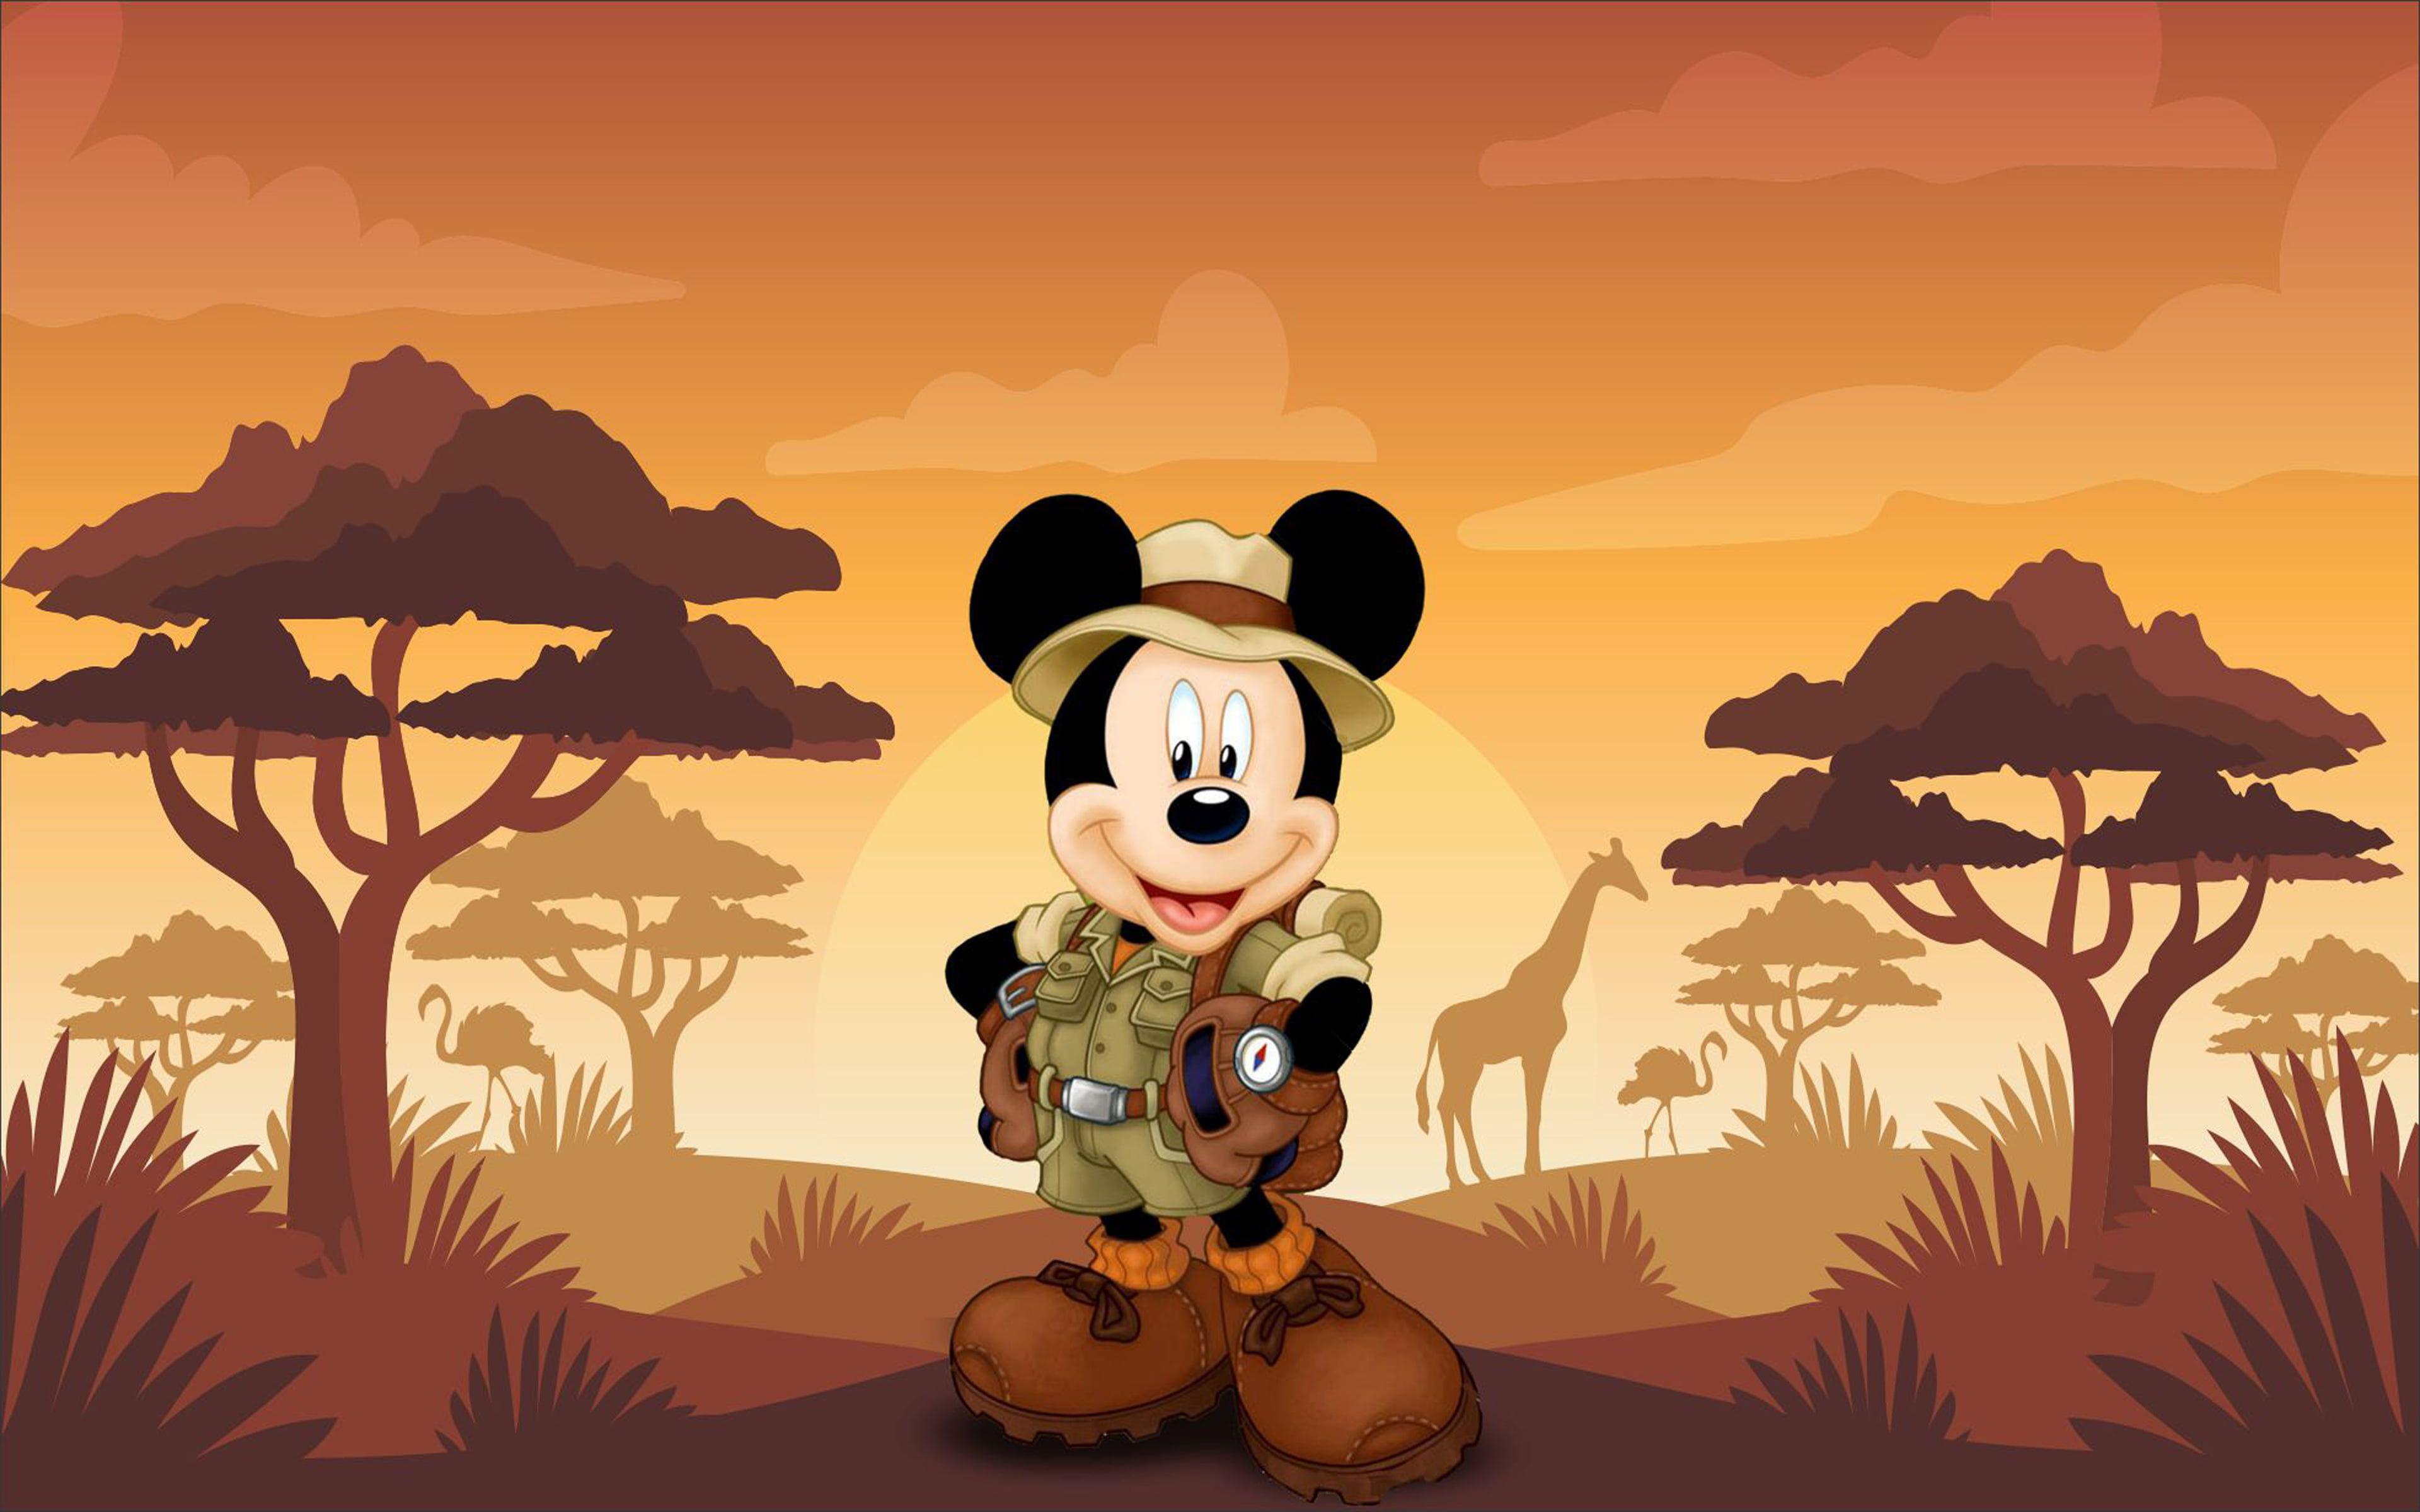 Mickey Mouse Cartoon Safari Sunset Hd Wallpaper 3840 2400 4k Wallpaper Hdwallpaper Desktop Mickey Mouse Cartoon Mickey Mouse Sunset Hd Wallpapers